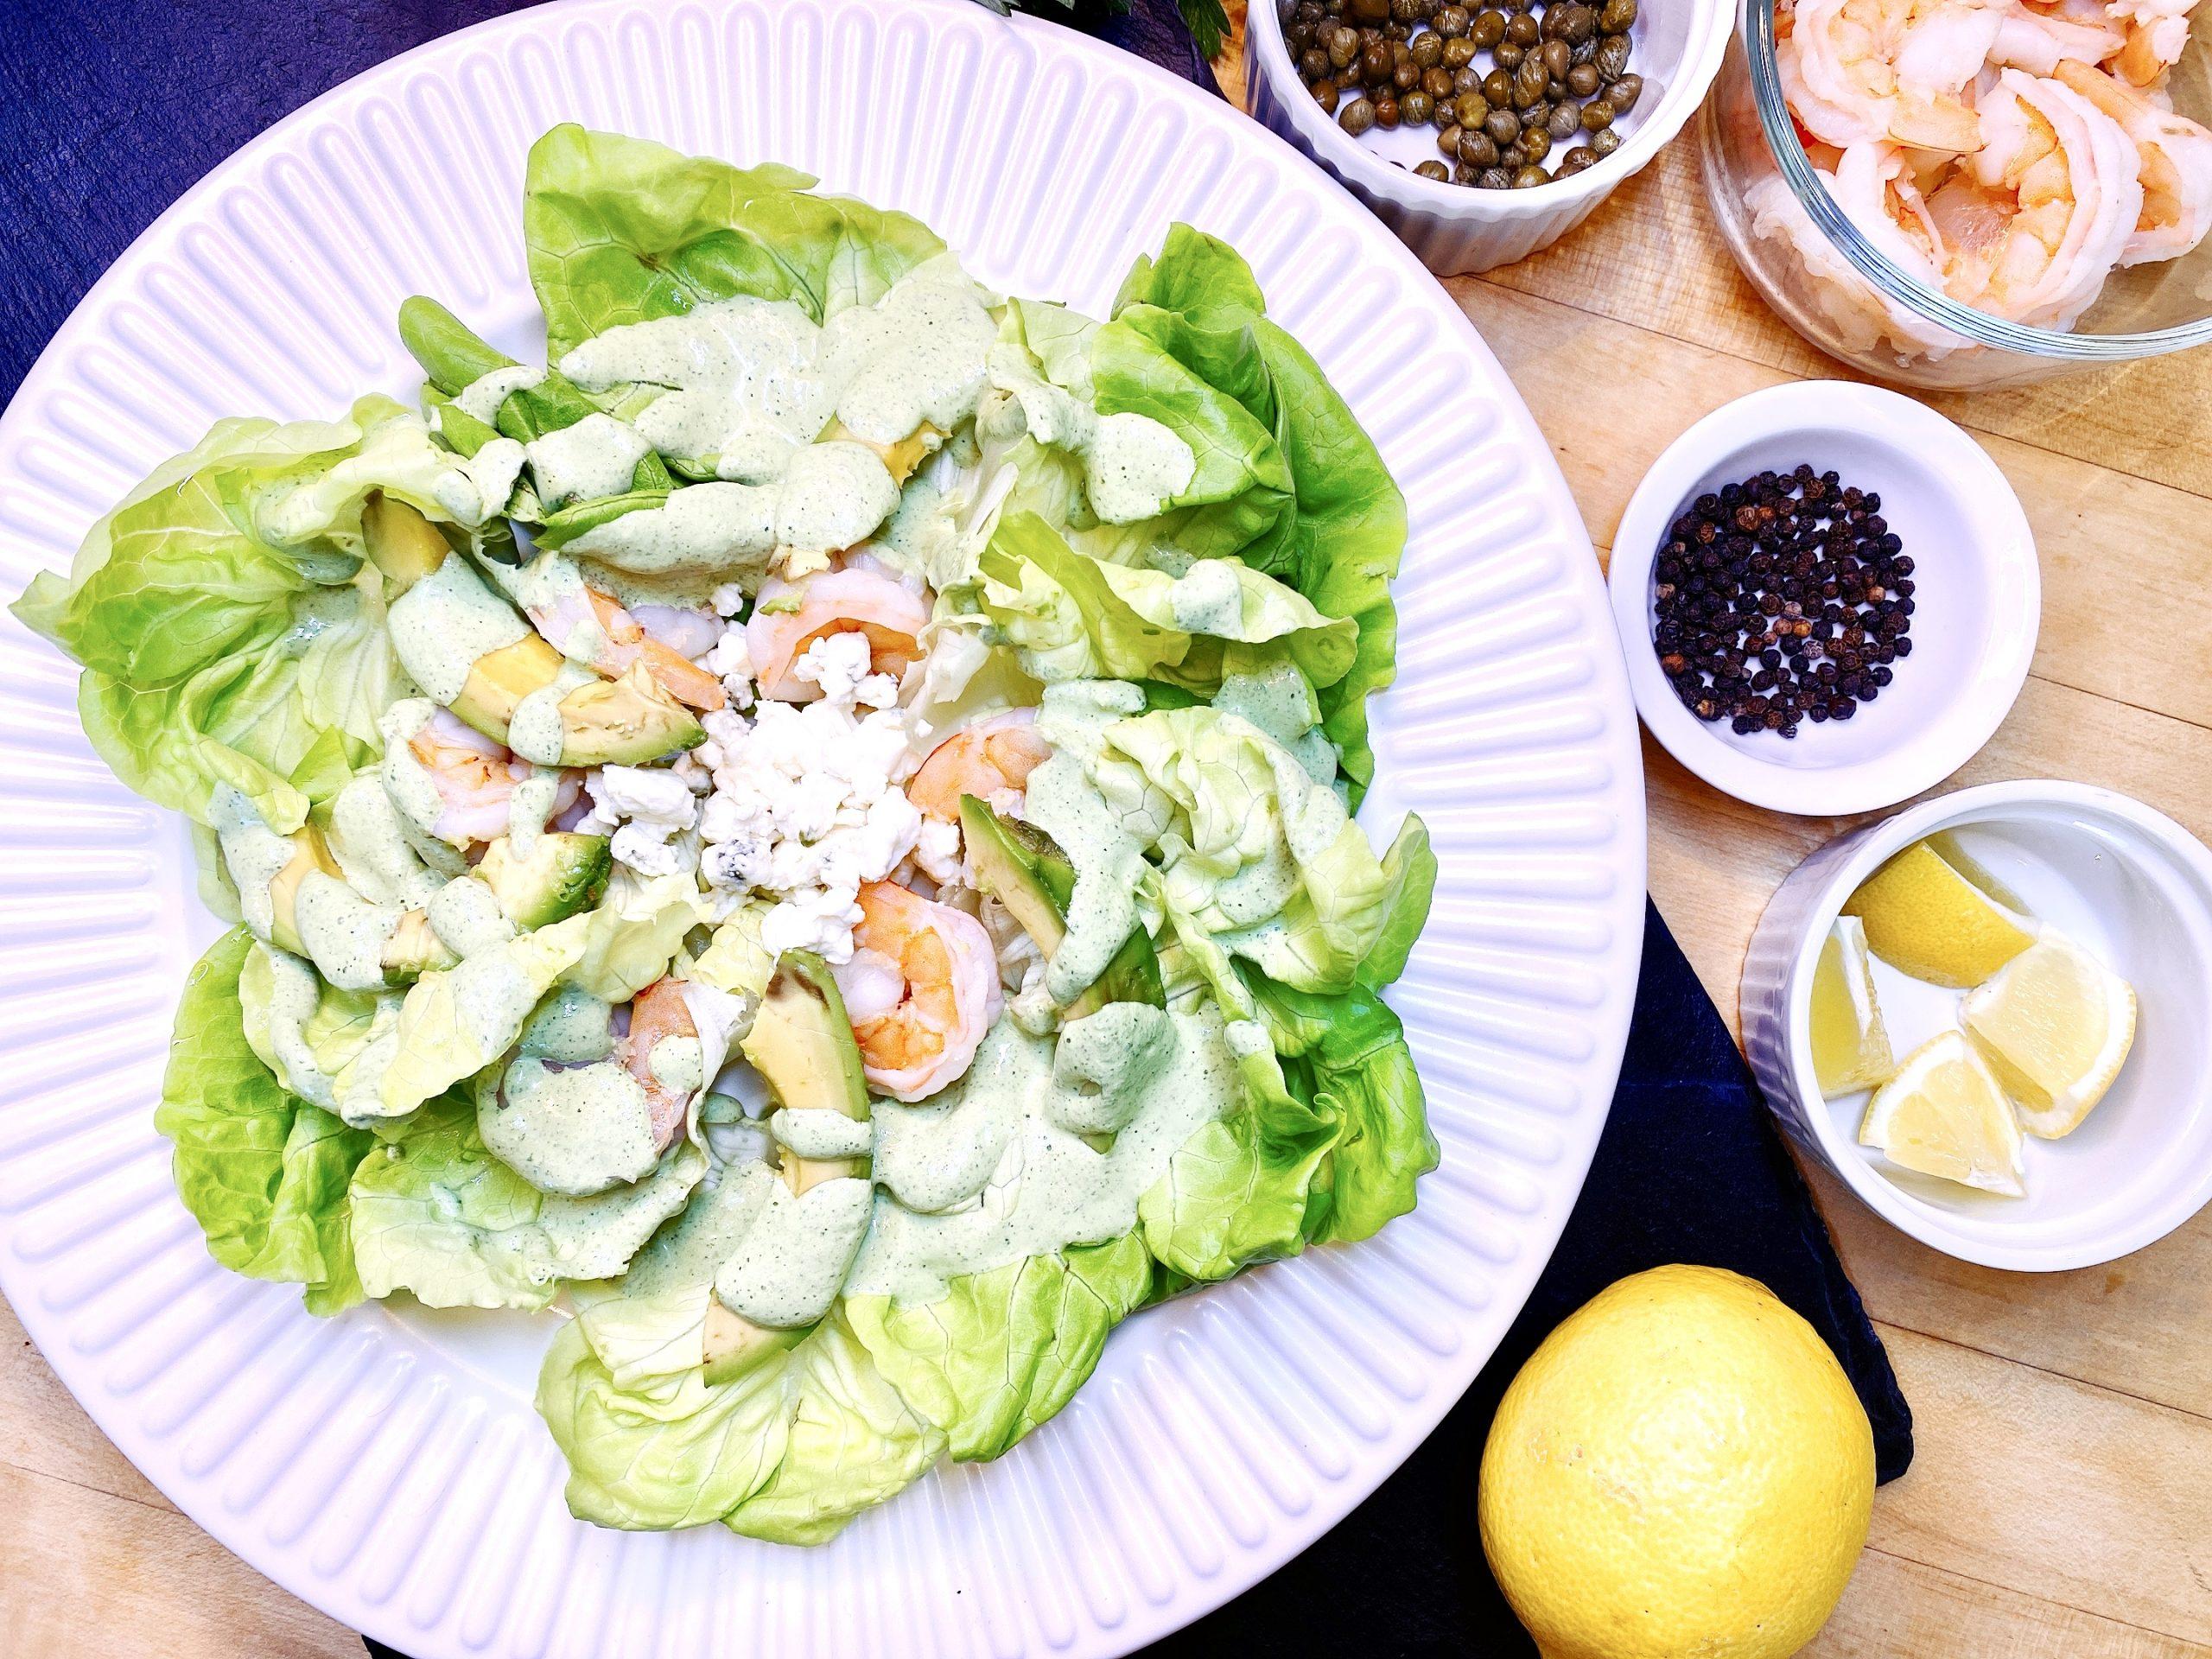 Plated Shrimp Salad with Green Goddess Dressing